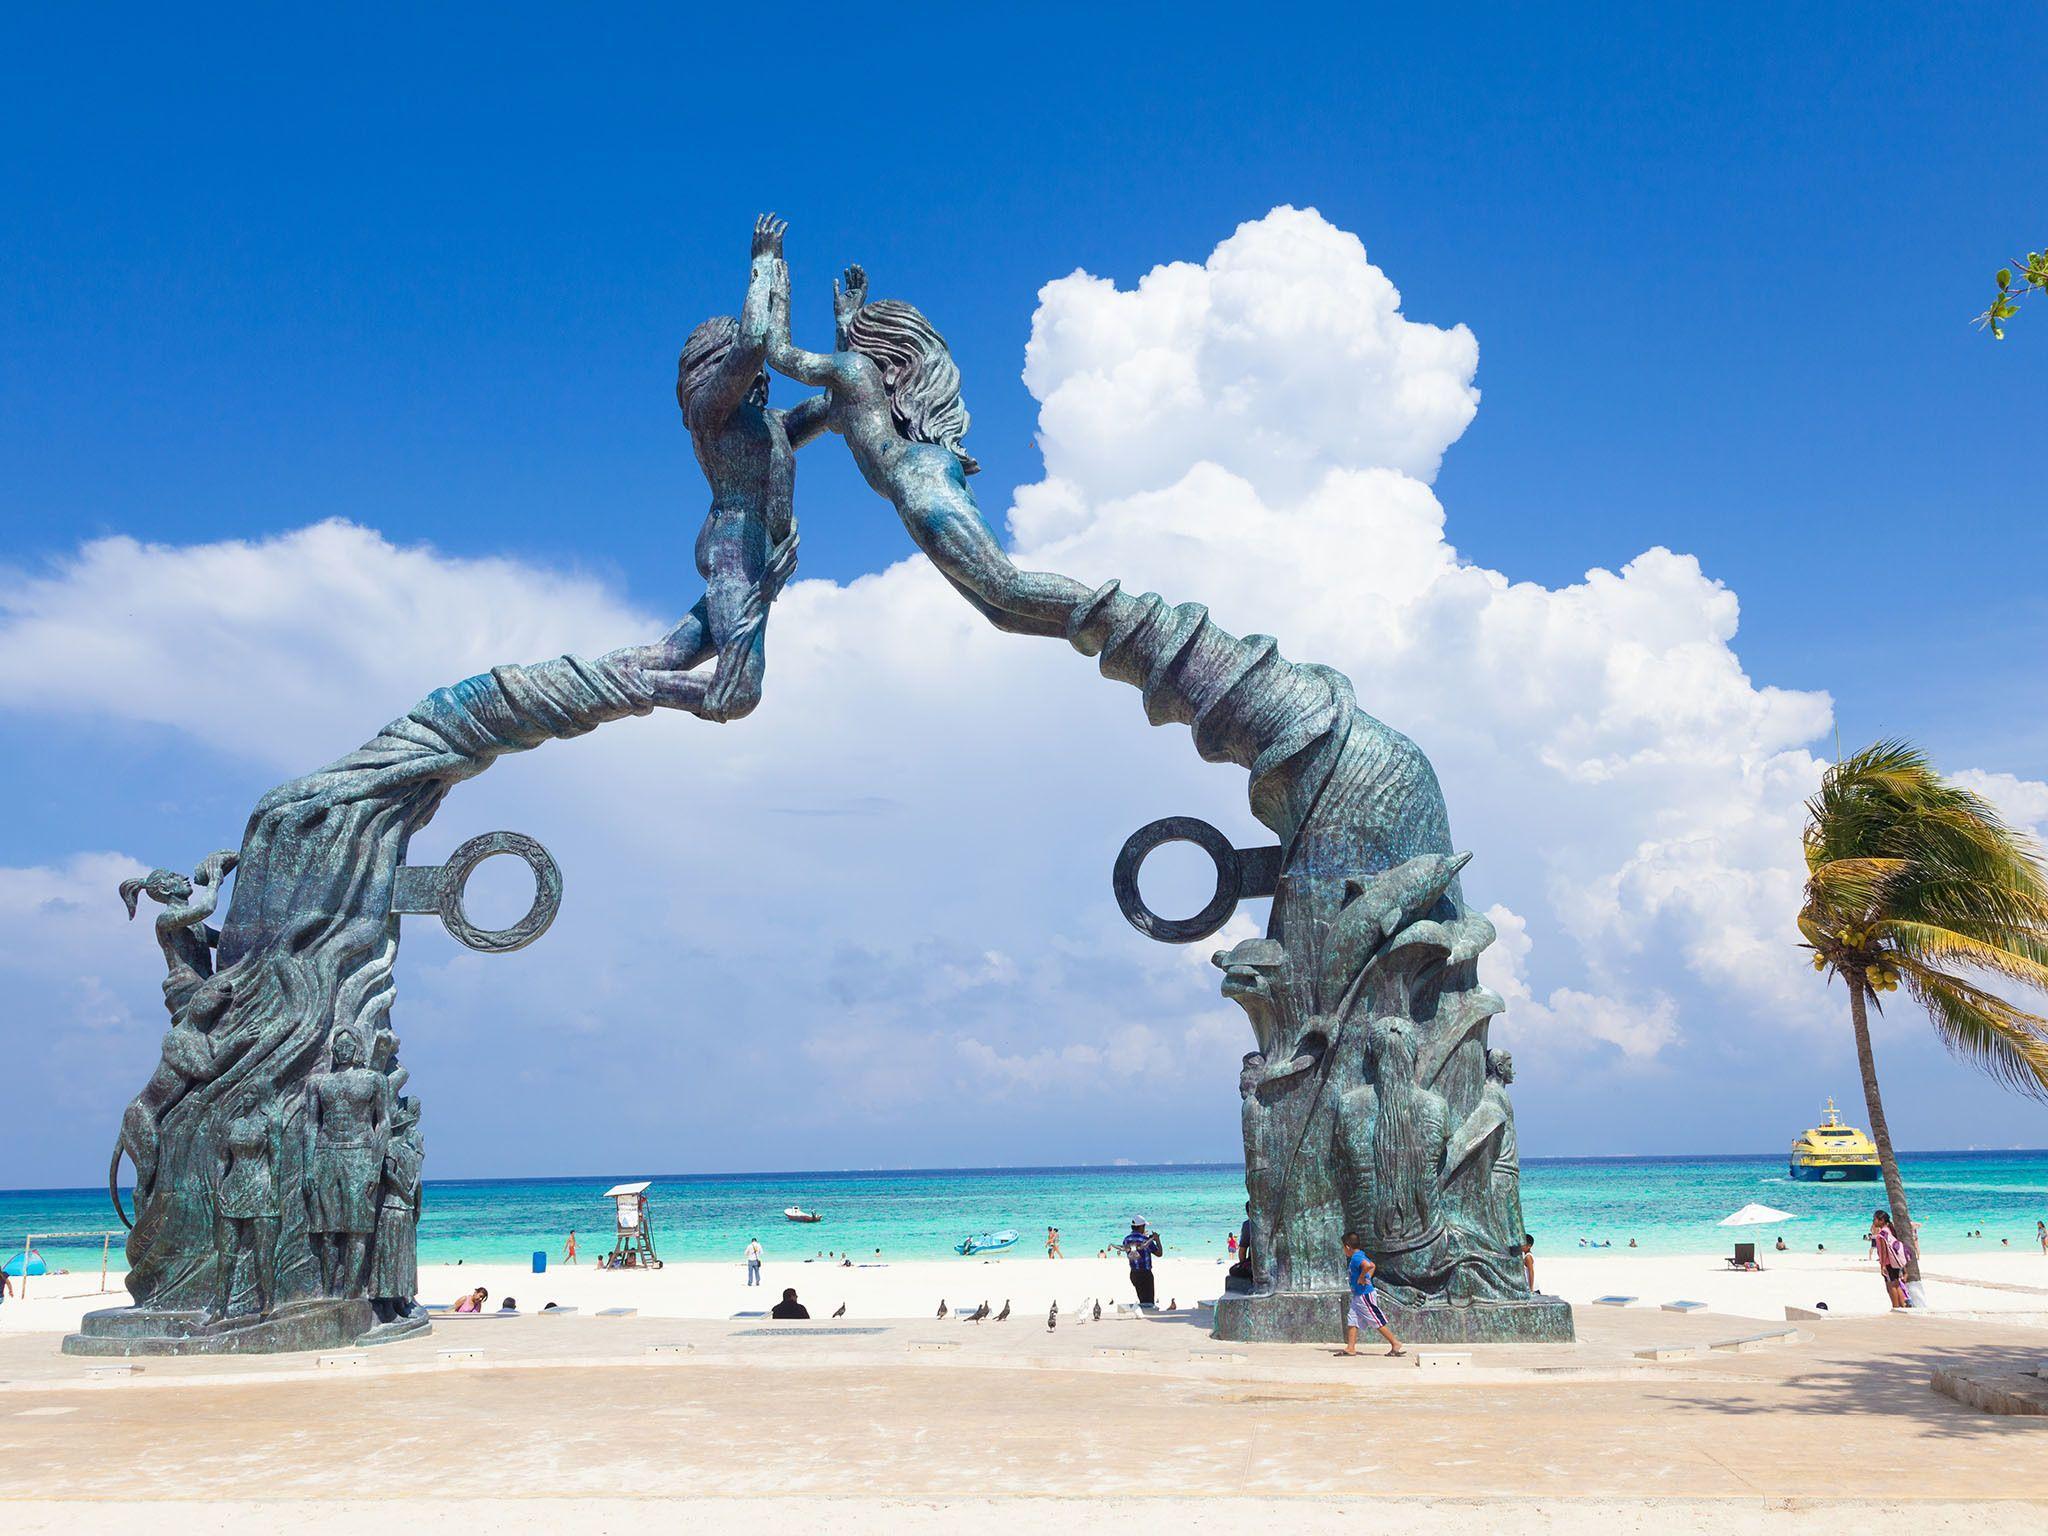 Playa Del Carmen Wallpapers - Top Free Playa Del Carmen Backgrounds - WallpaperAccess